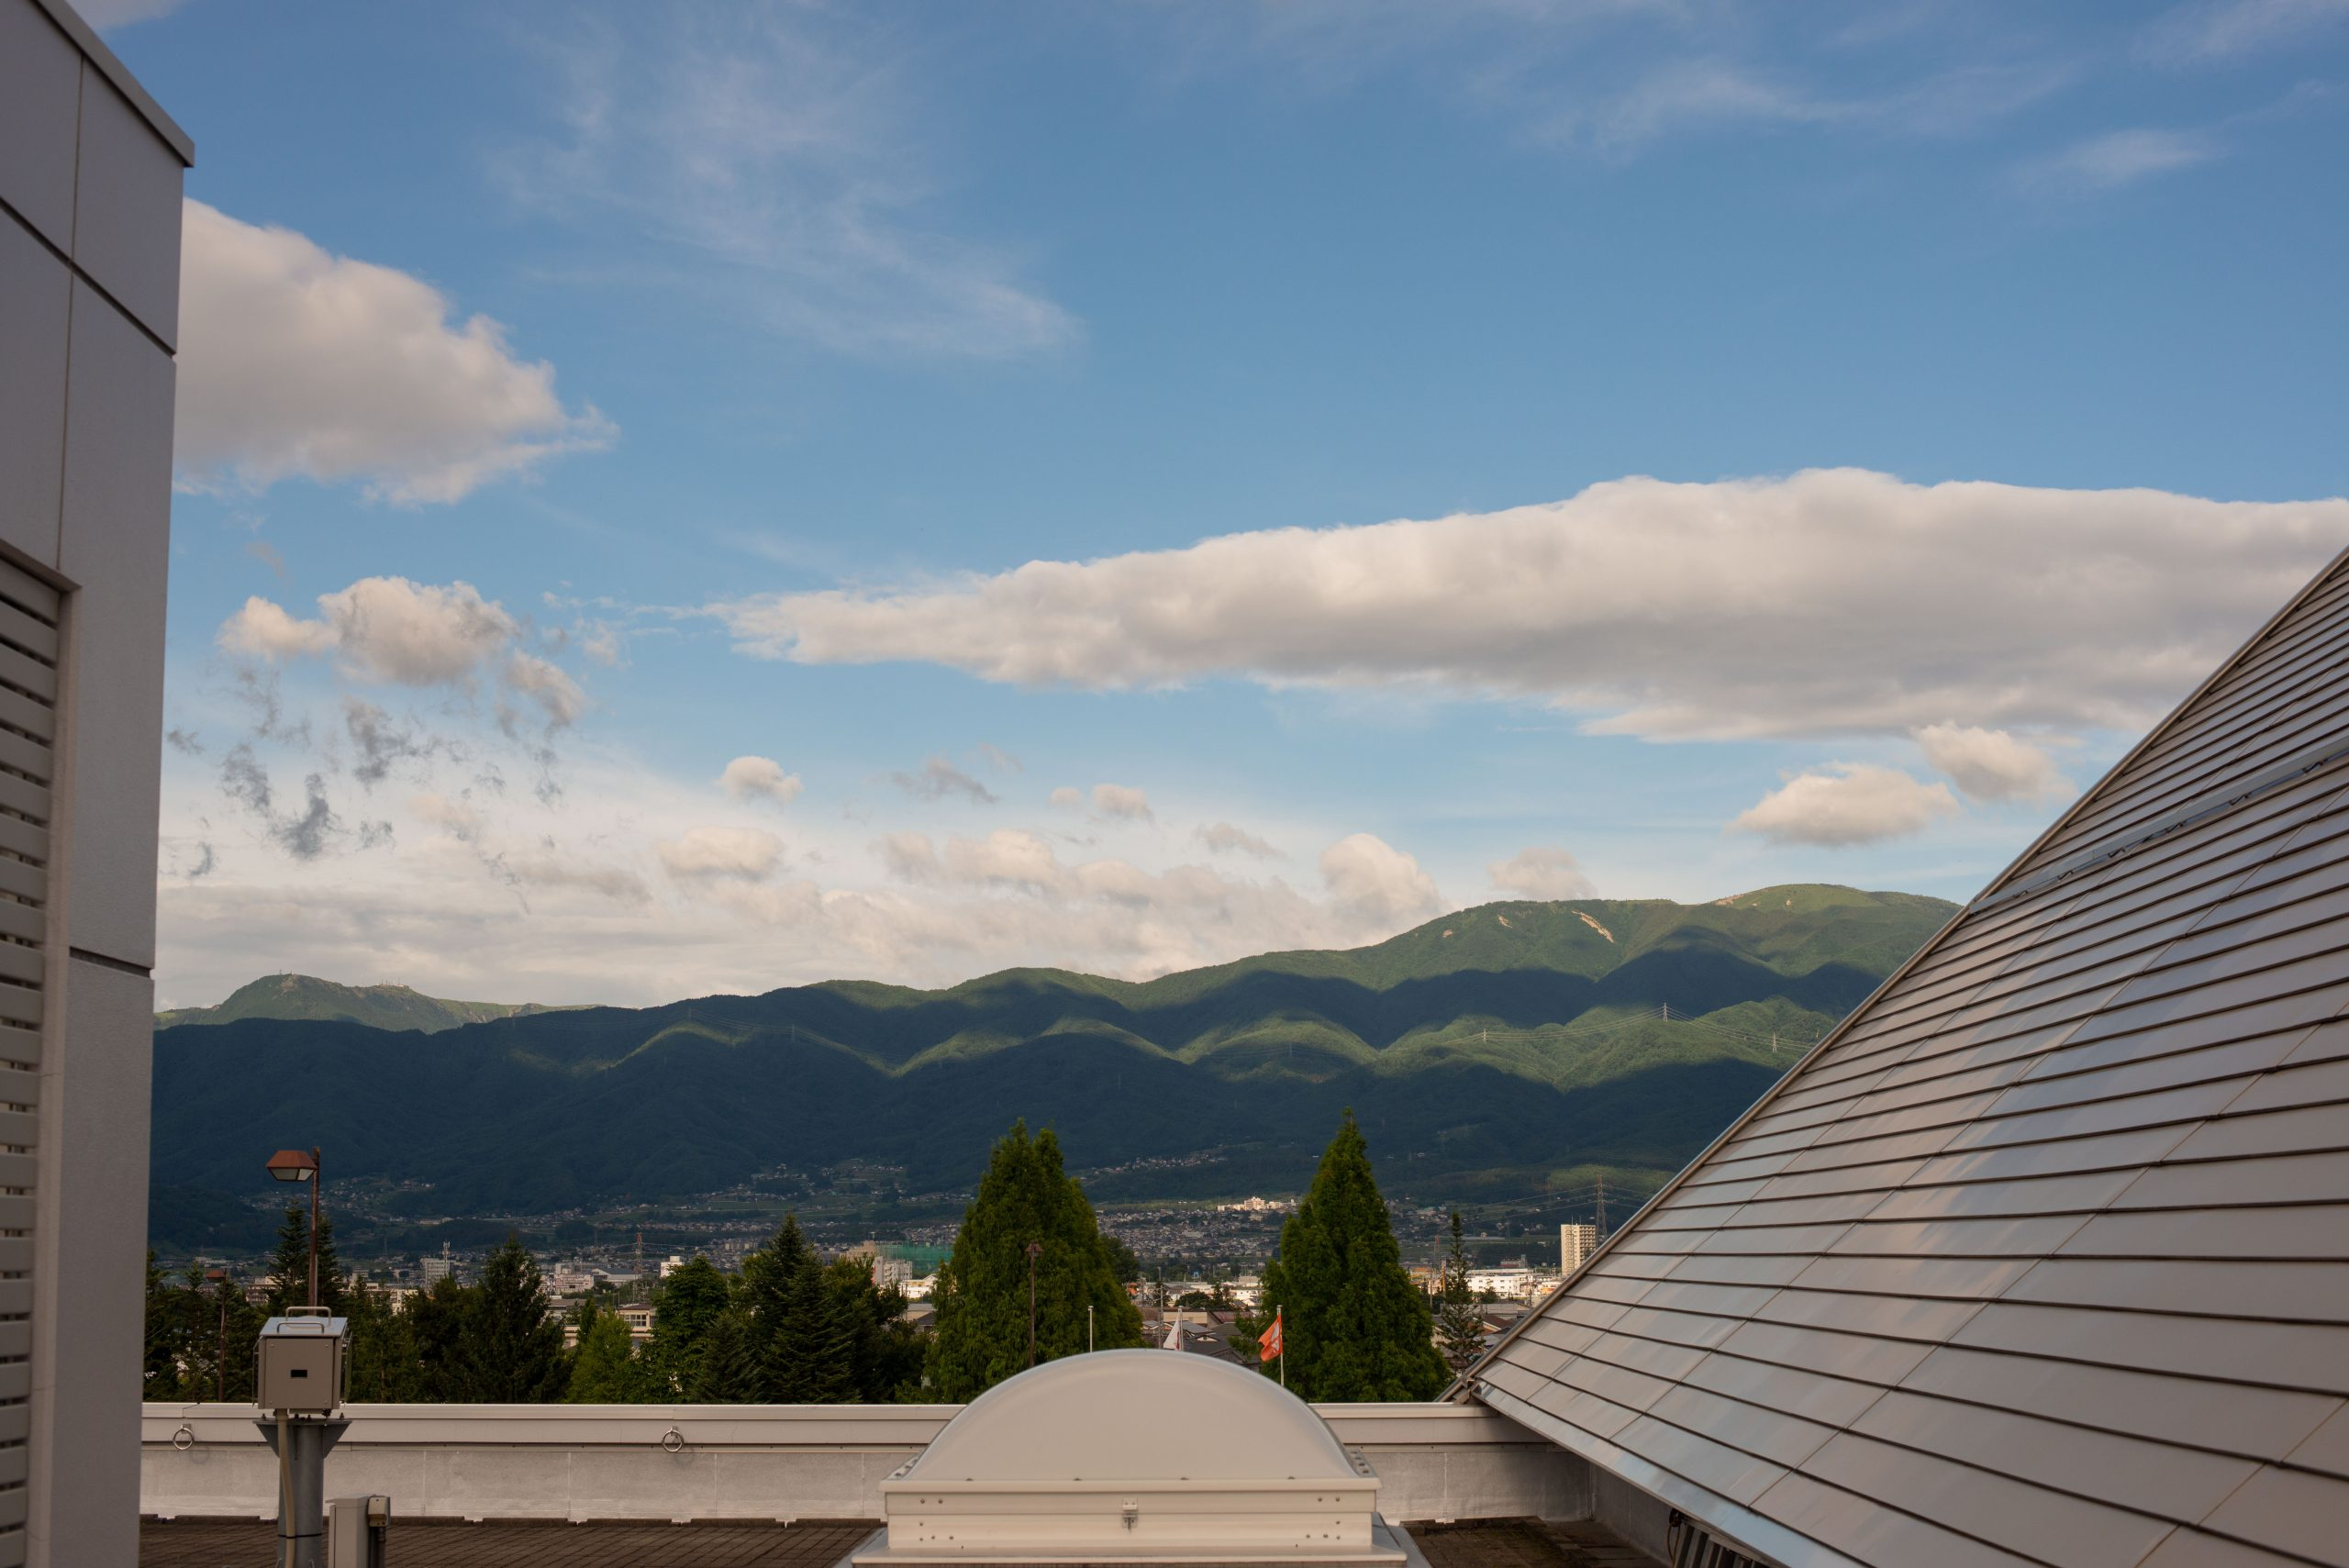 【Nikon】スナップショット~夏空に雲